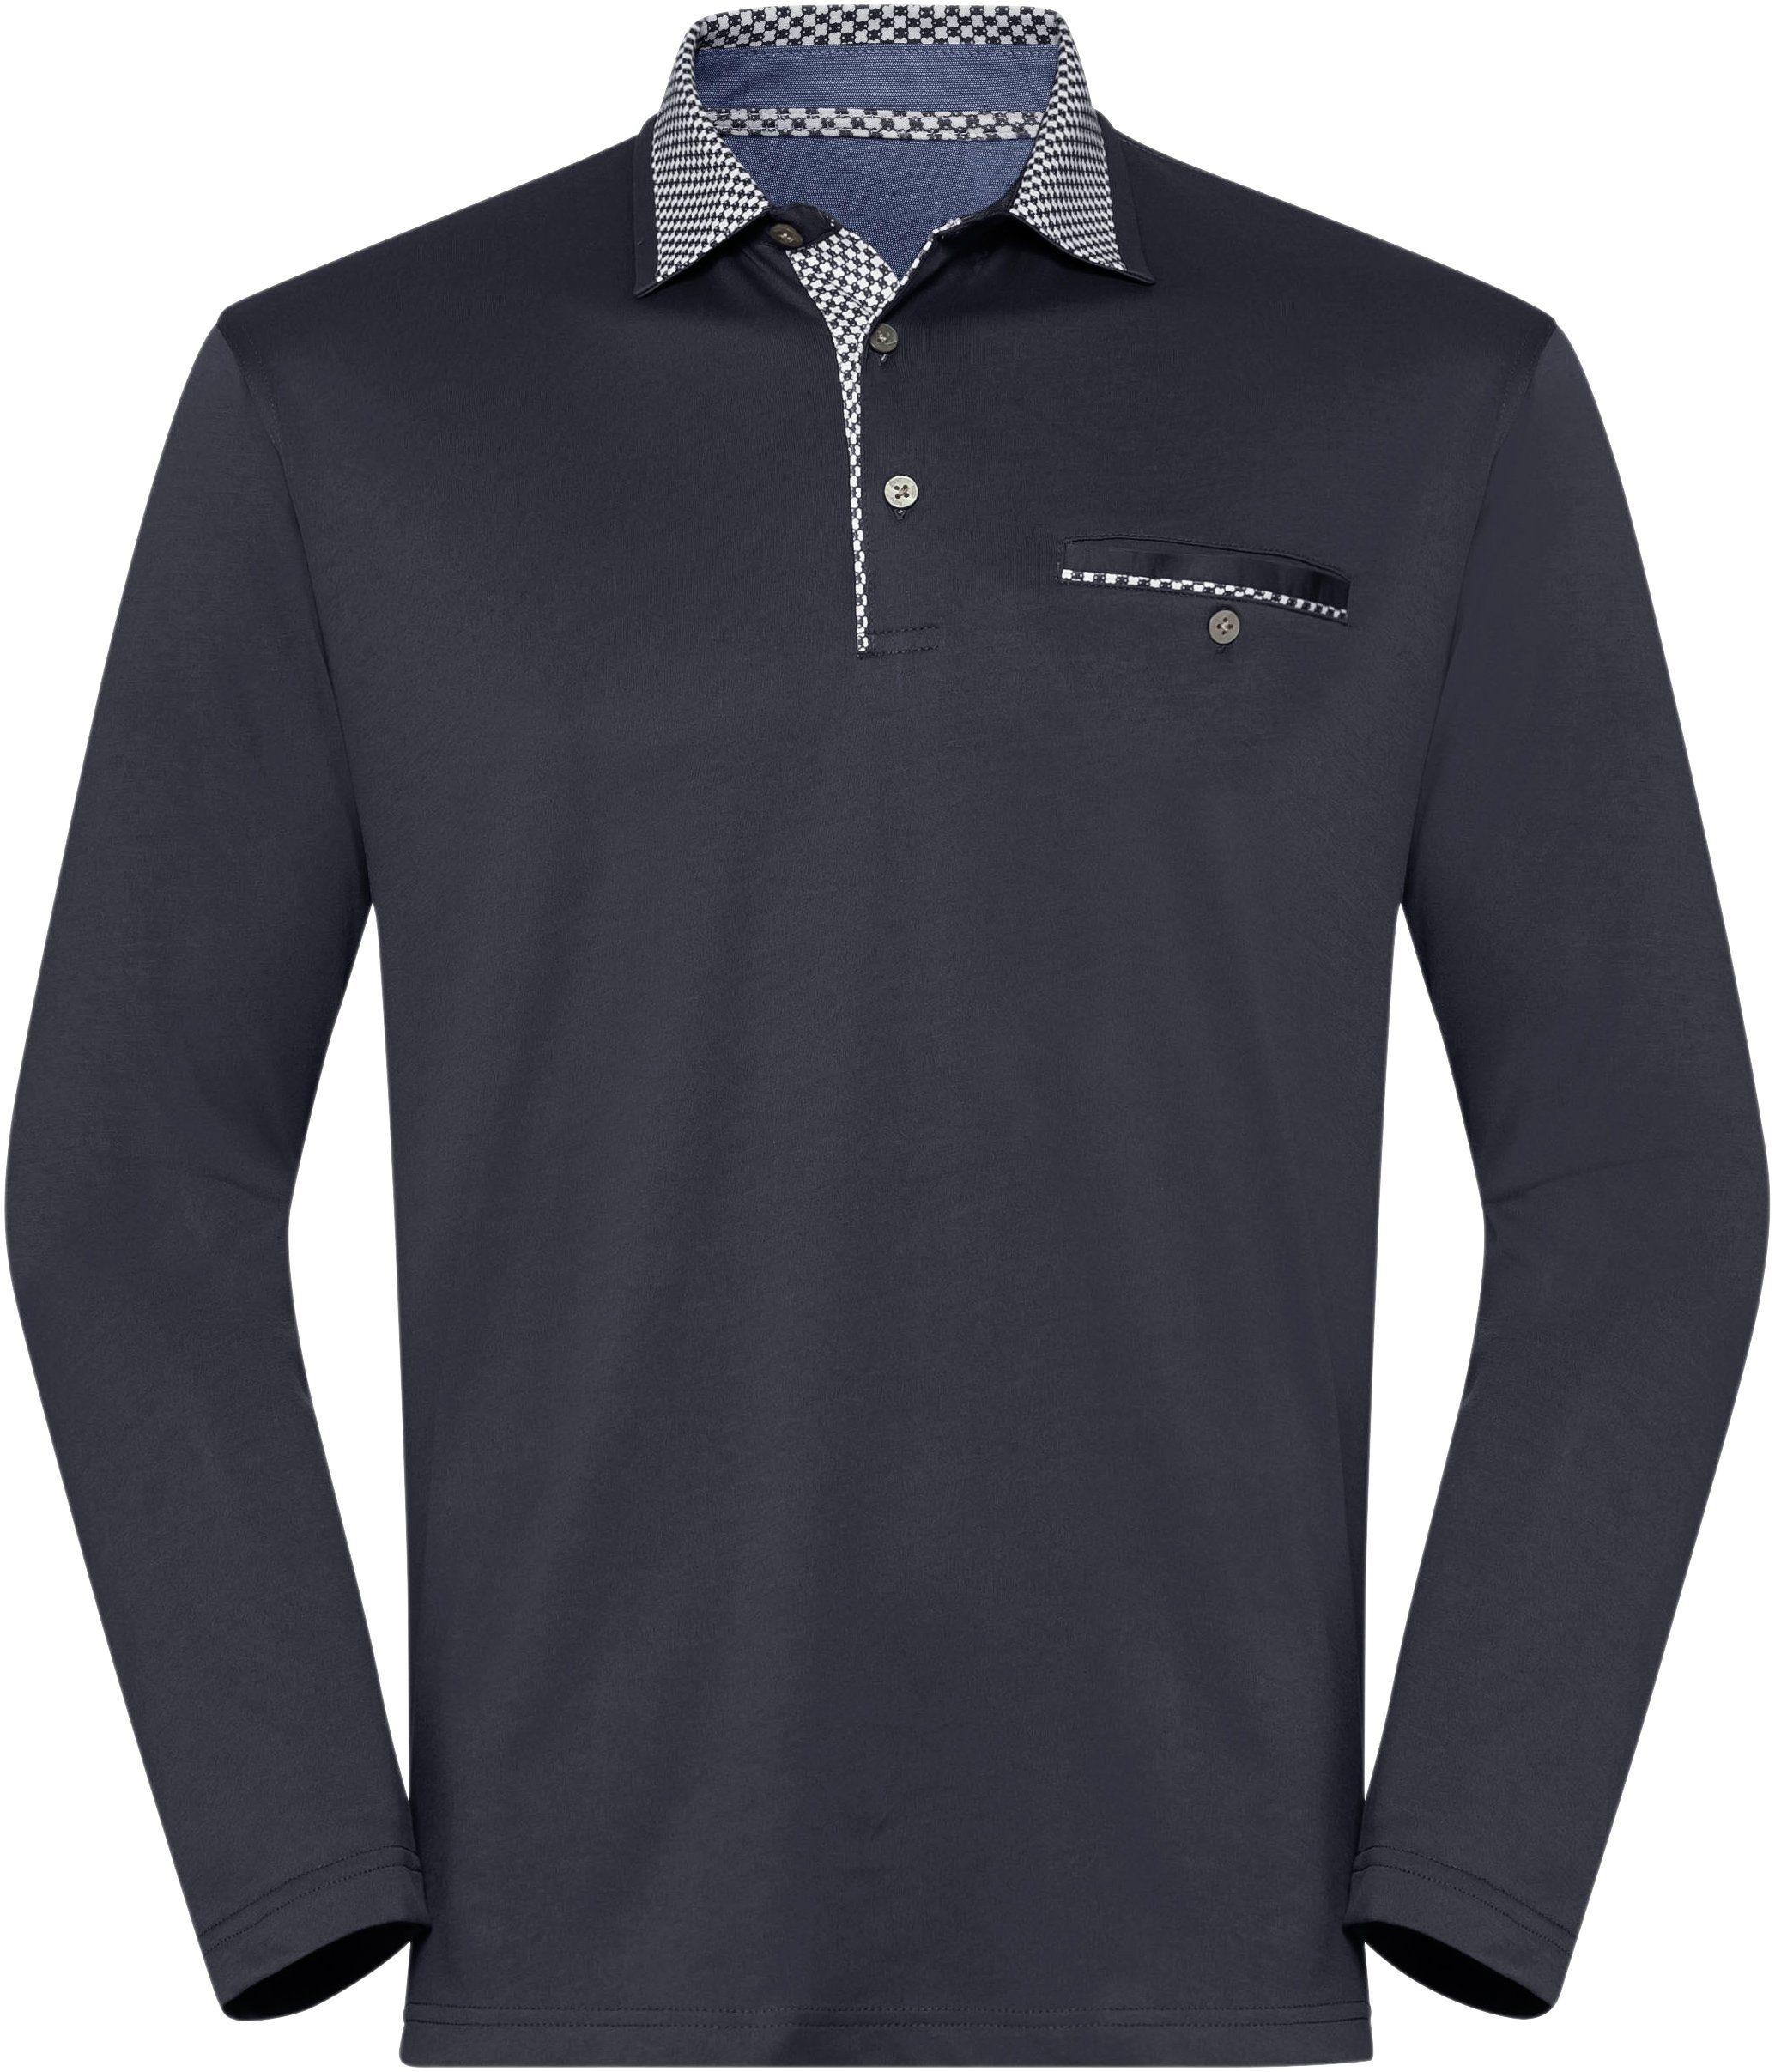 Hajo Langarm-Shirt in stay fresh-Qualität